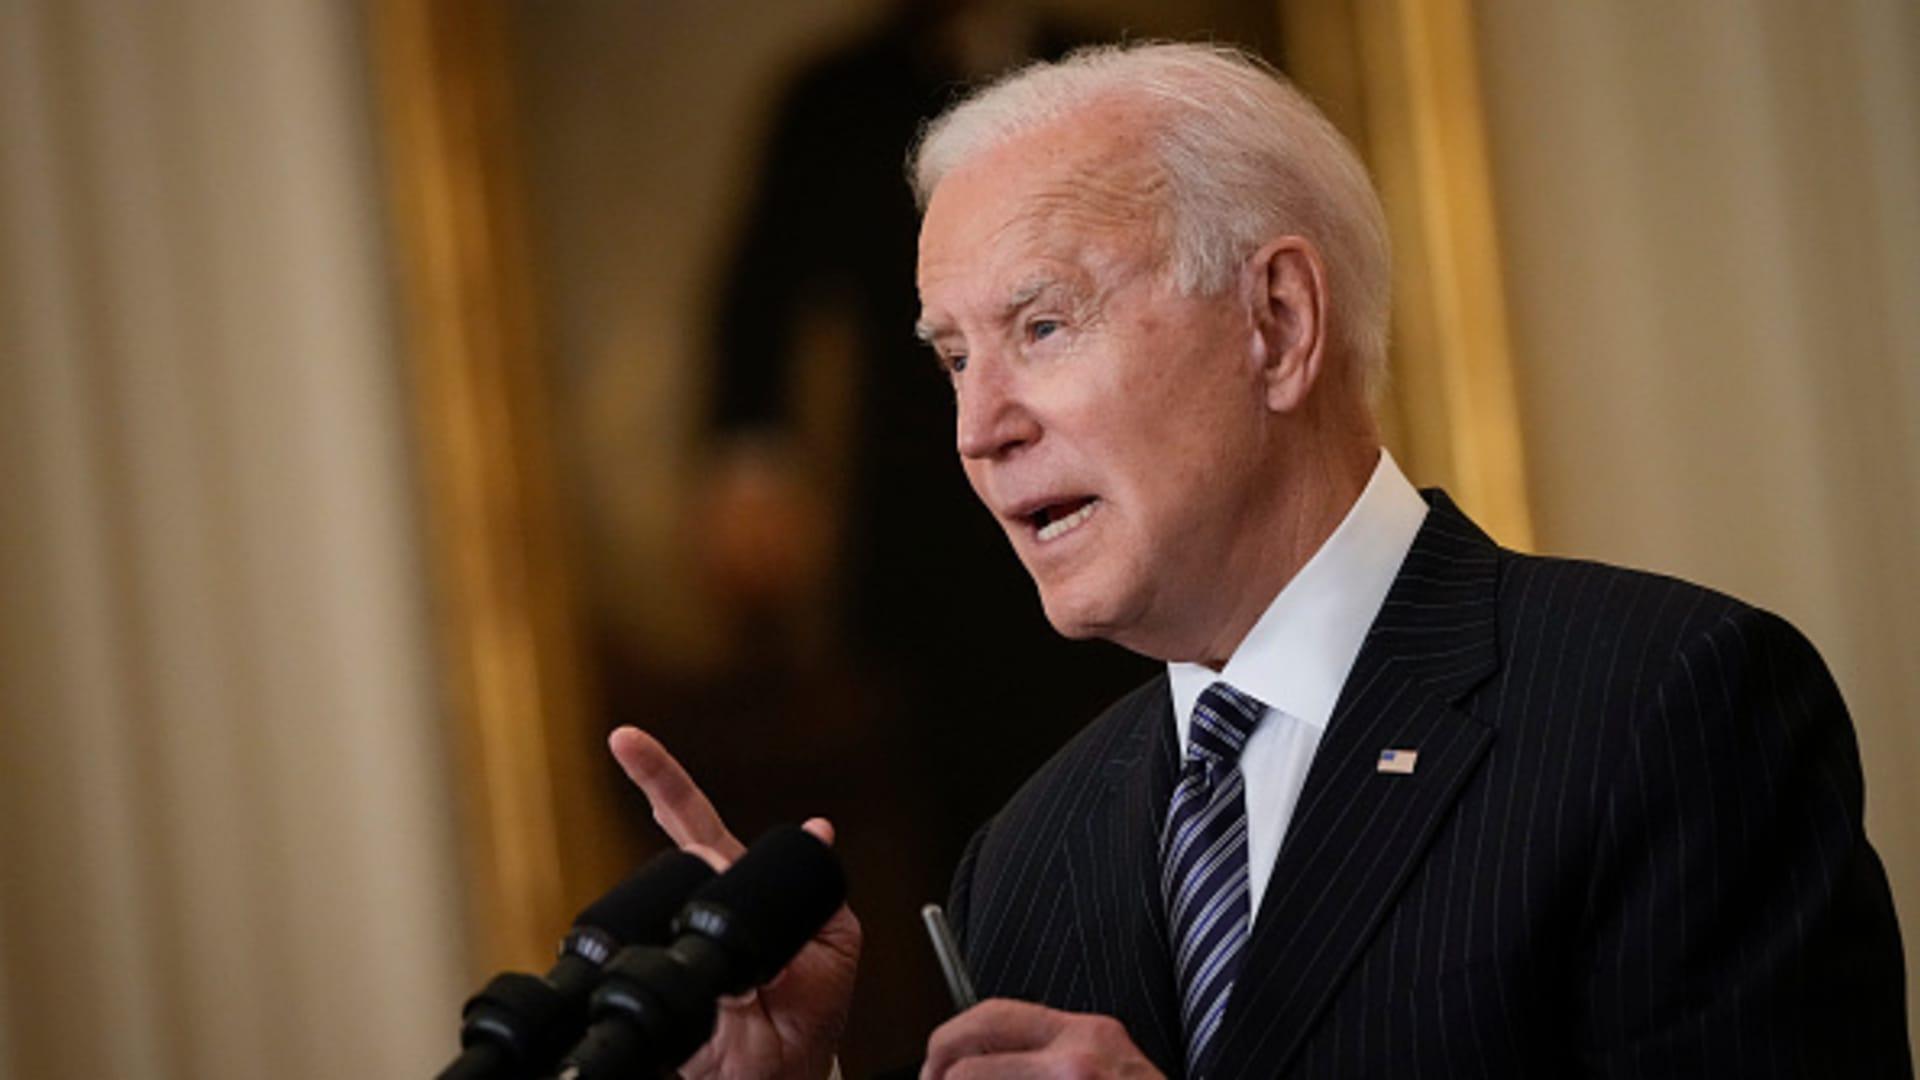 President Joe Biden speaks in the East Room of the White House on March 18, 2021 in Washington, DC.